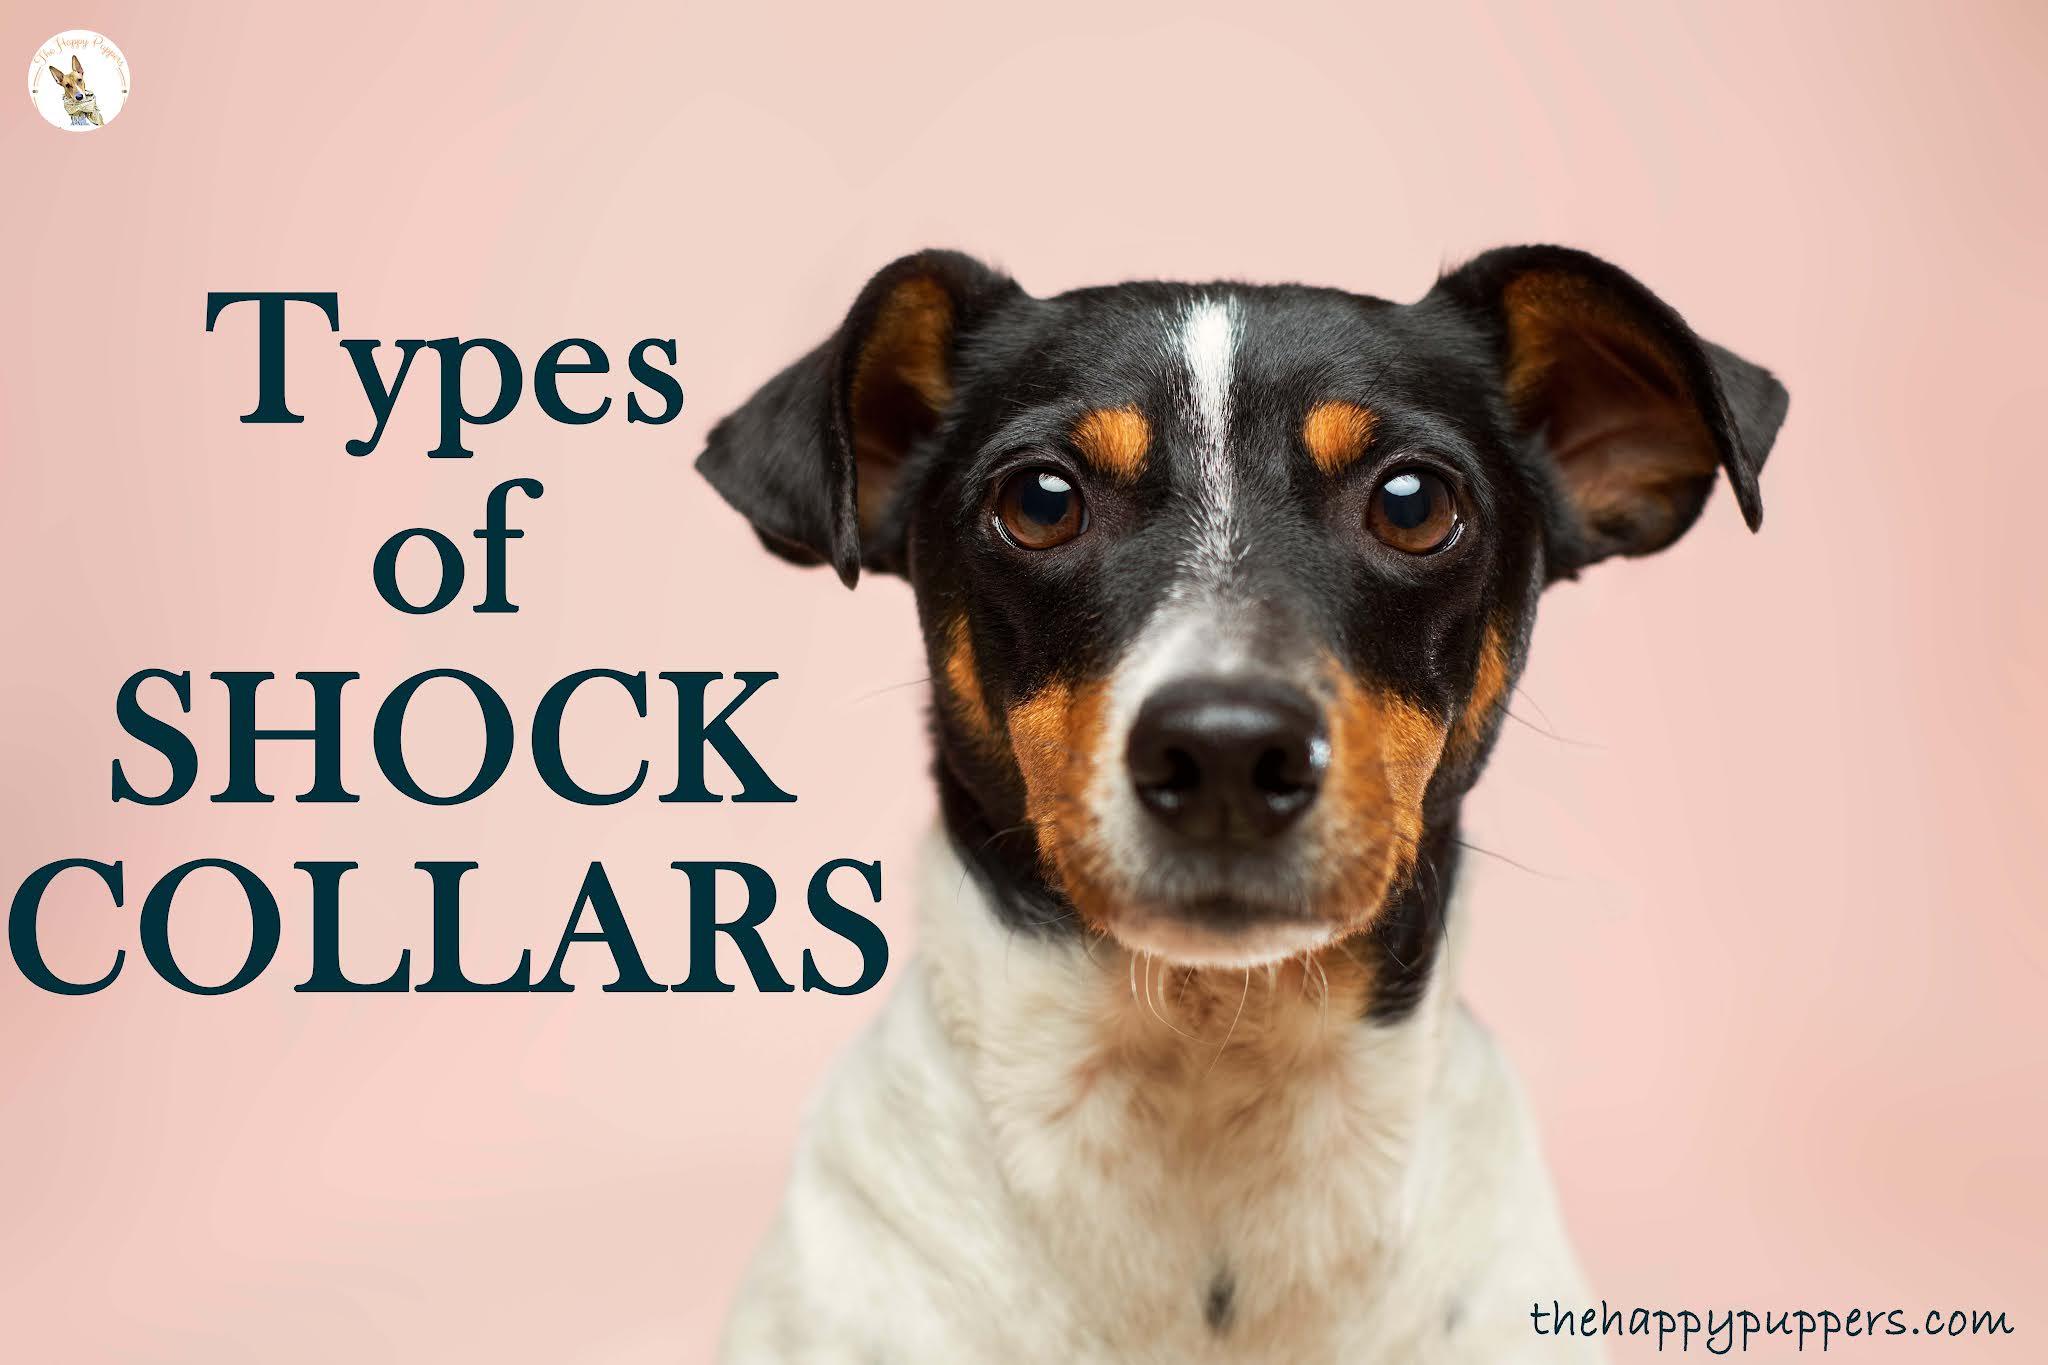 Types of shock collars